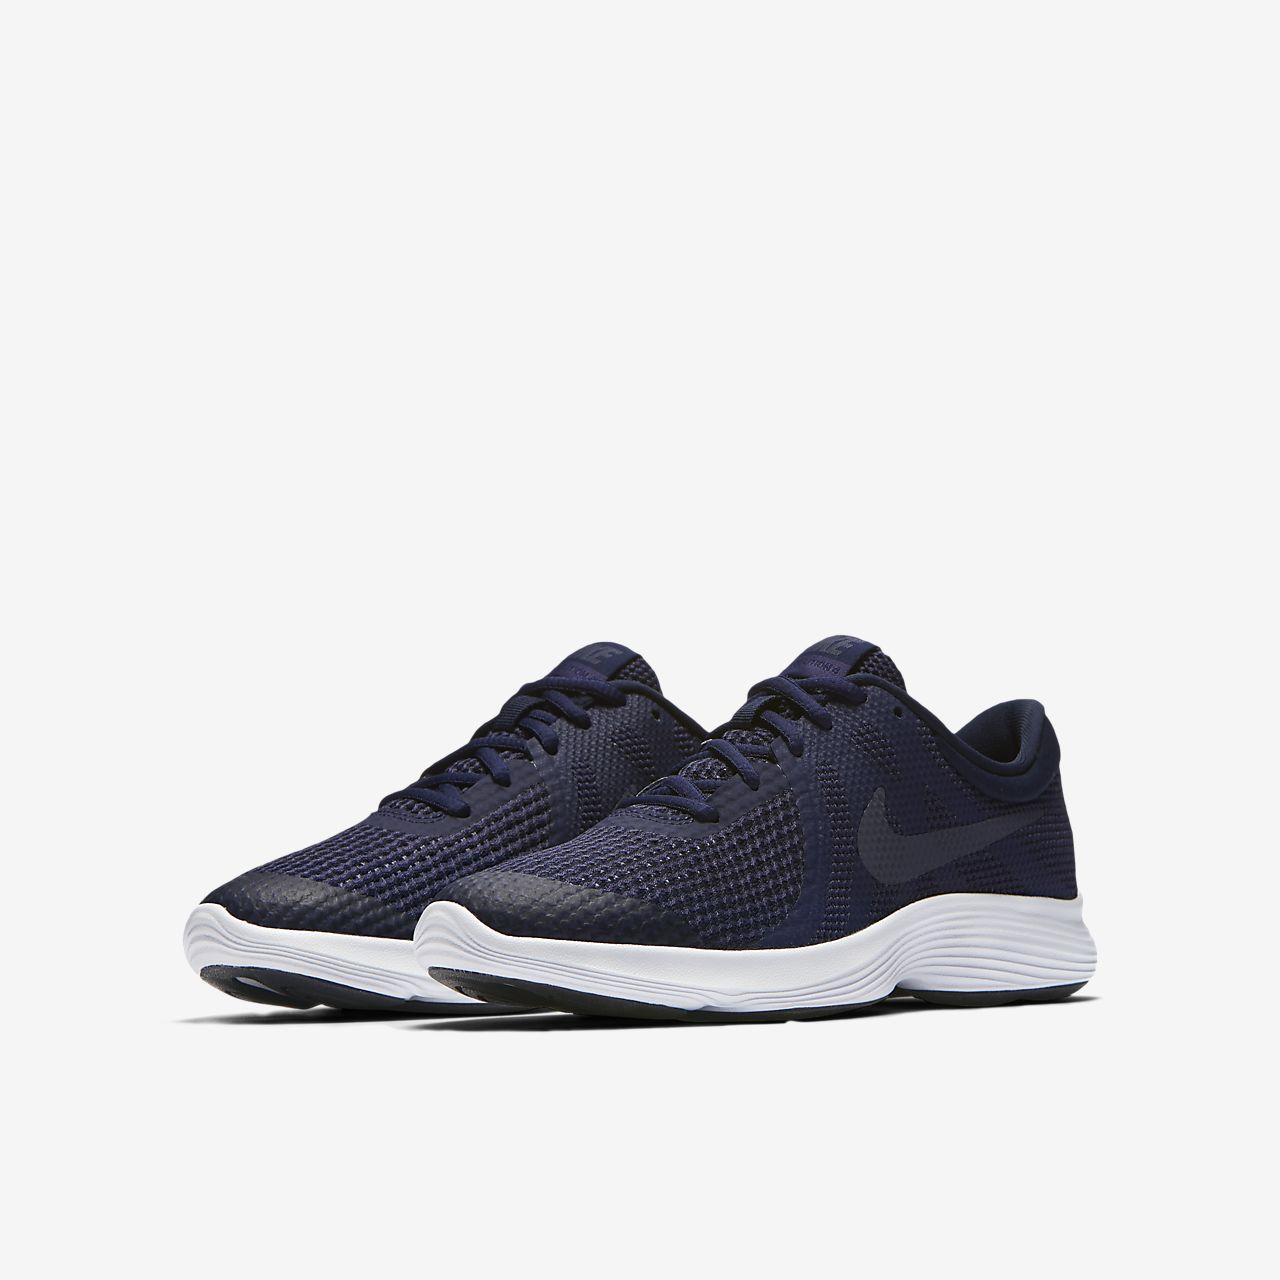 67f04d8a5362a Nike Revolution 4 Older Kids  Running Shoe. Nike.com IE